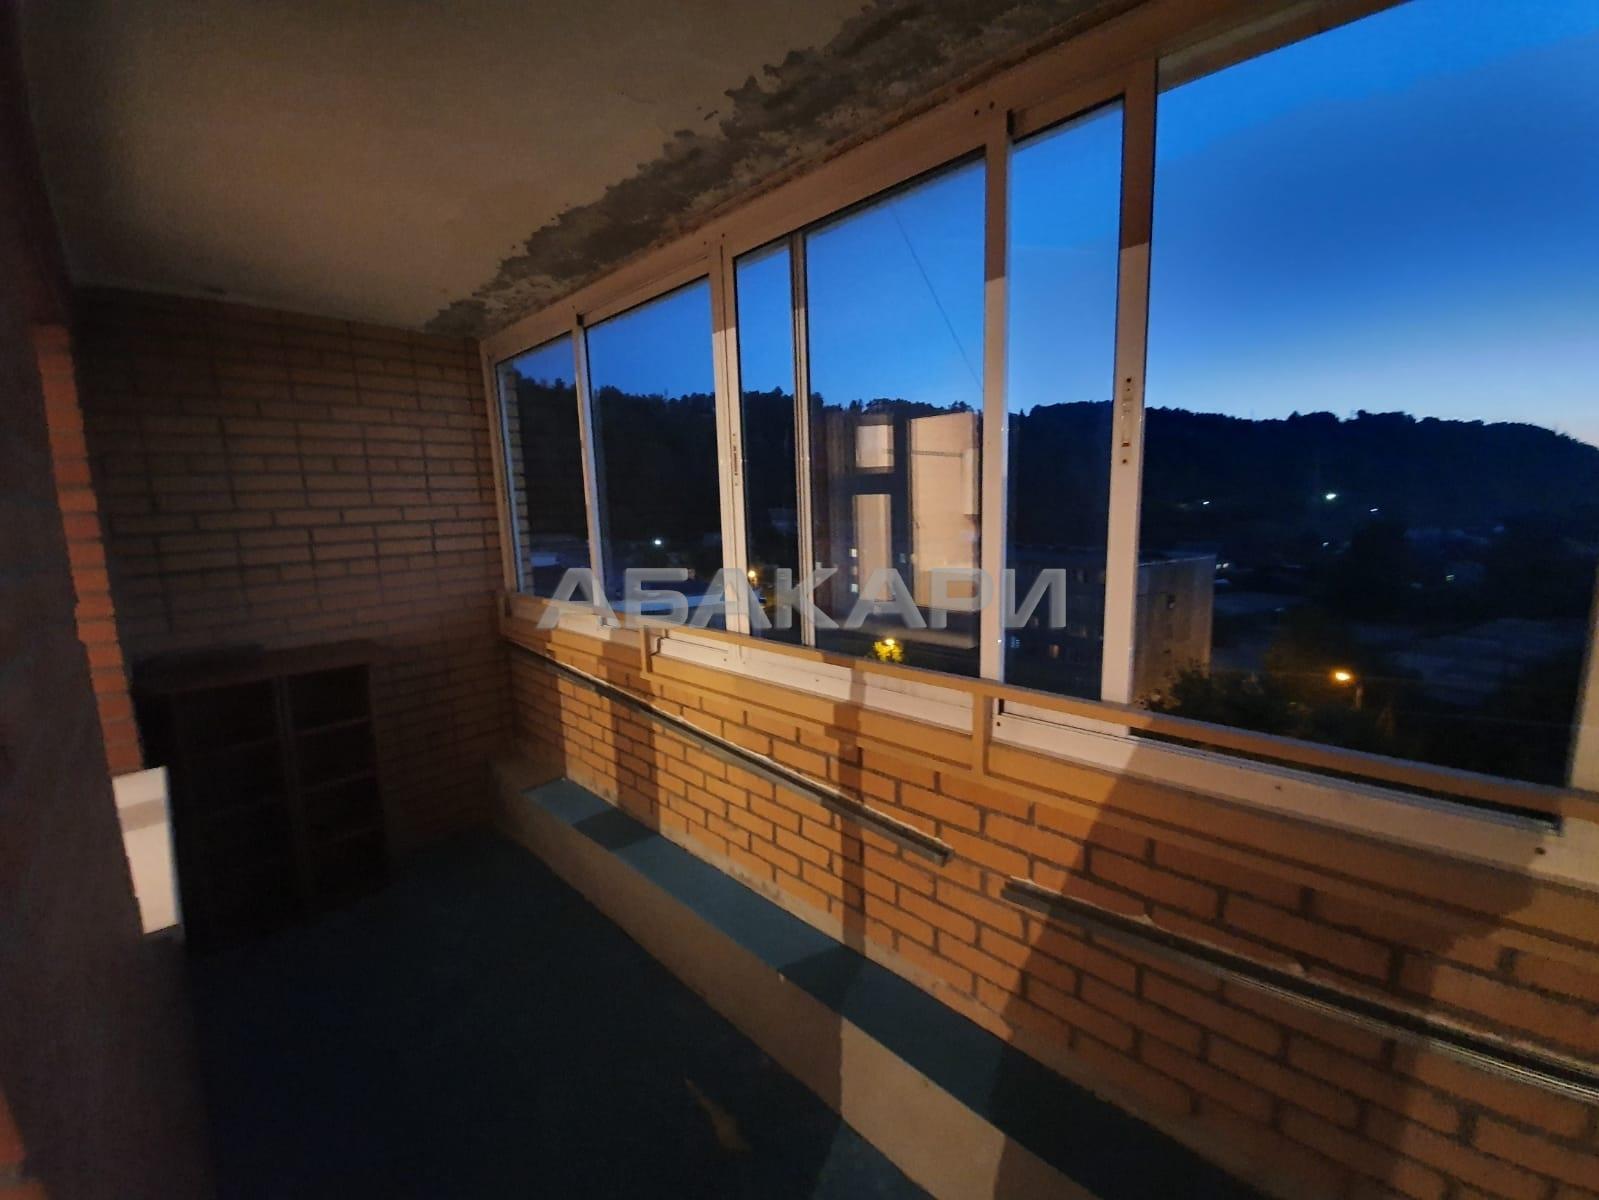 1к квартира переулок Медицинский, 14 д | 14000 | аренда в Красноярске фото 4